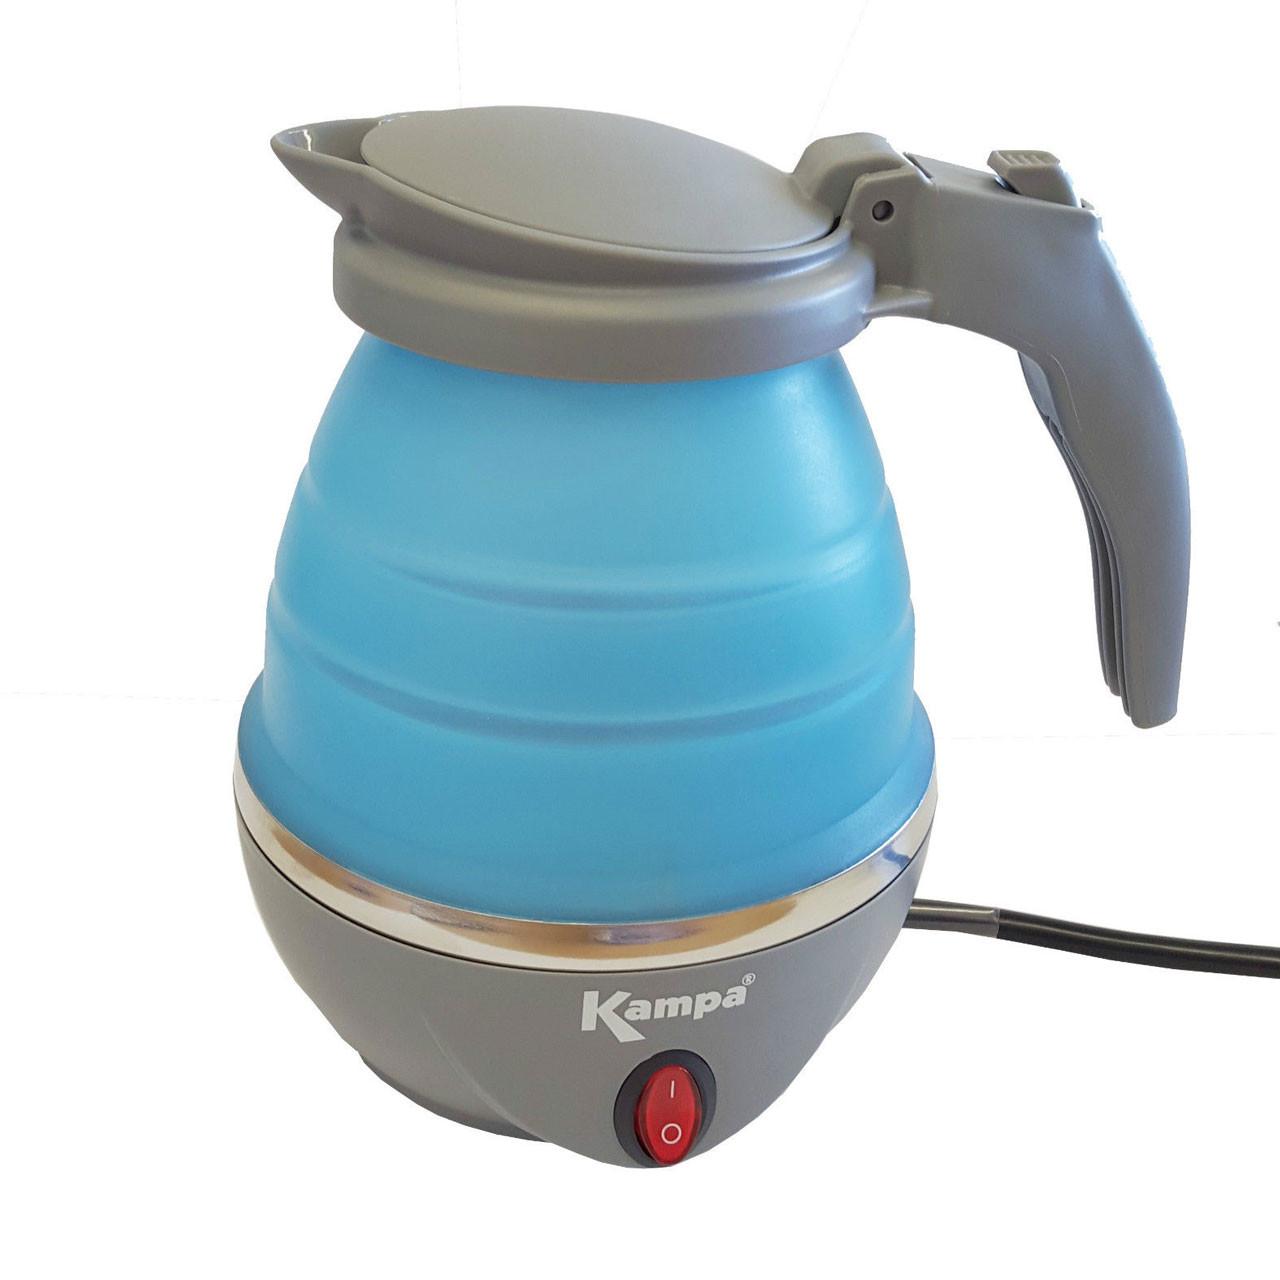 Kampa Squash 0.8L Electric Kettle